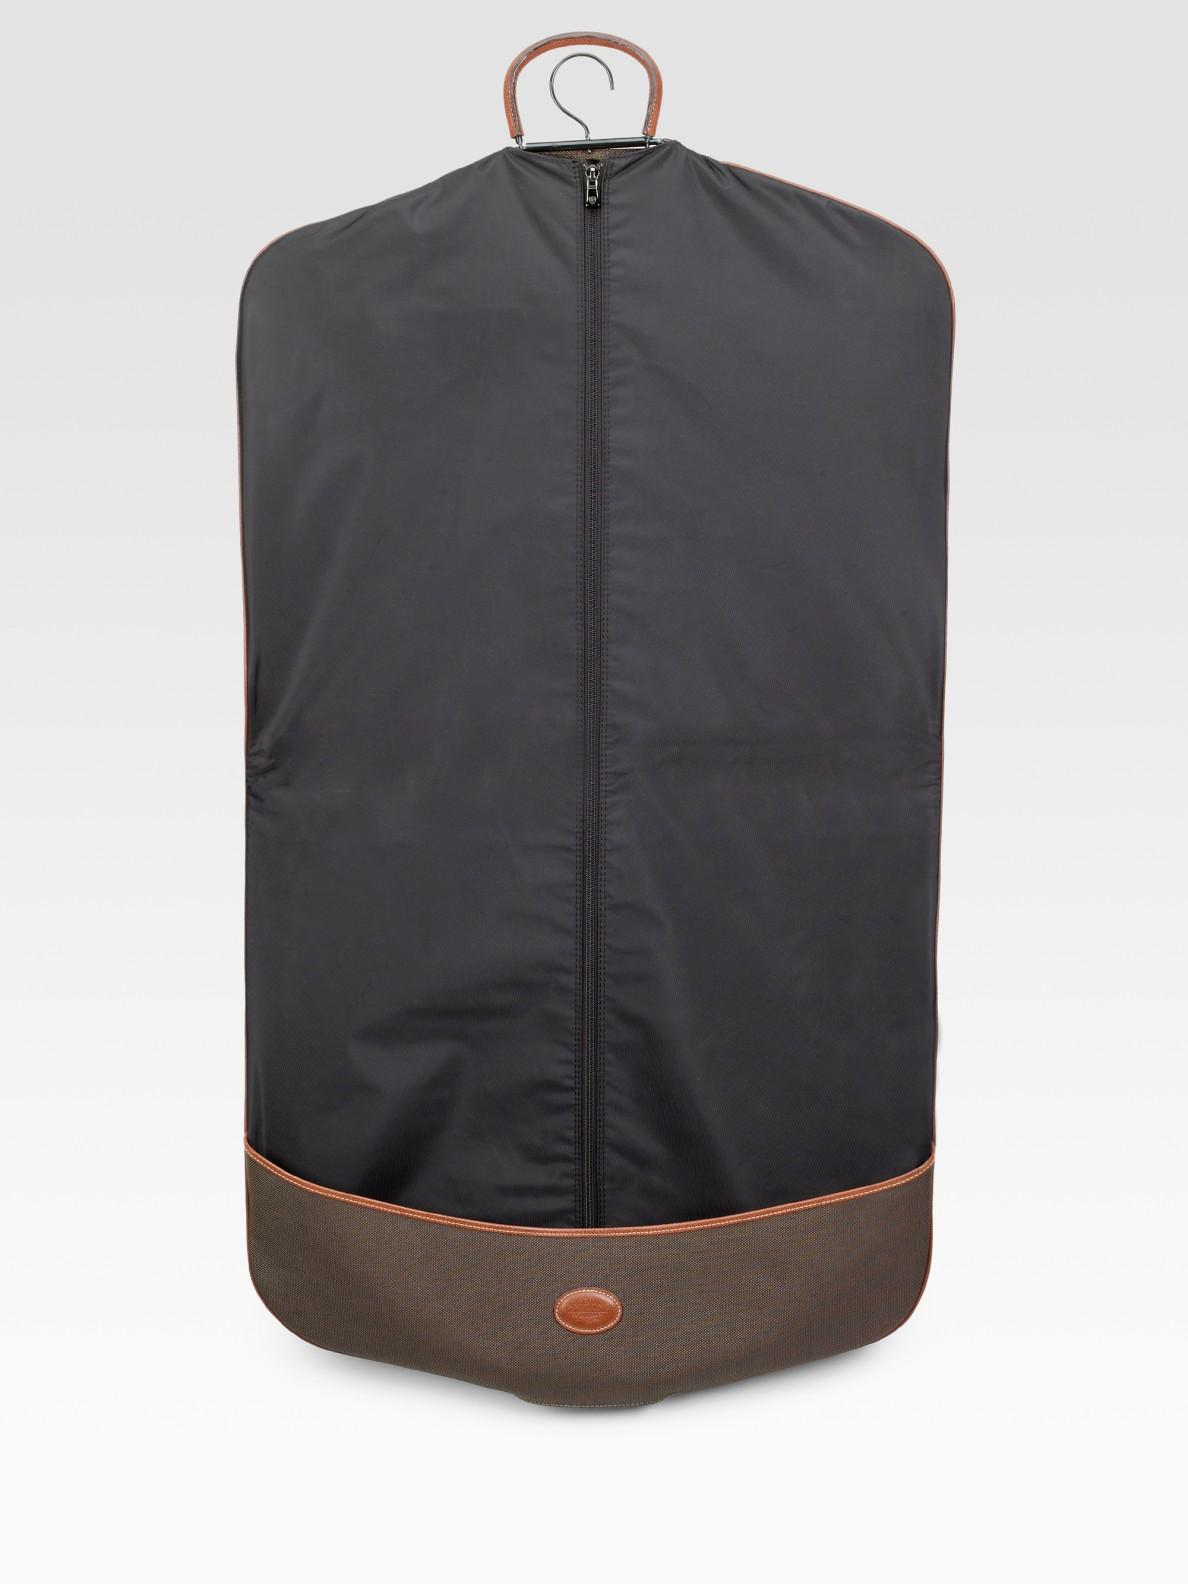 Lyst longchamp boxford hanging garment bag in brown for men jpg 1188x1584 Garment  bag brown dca1f7f6cbee5